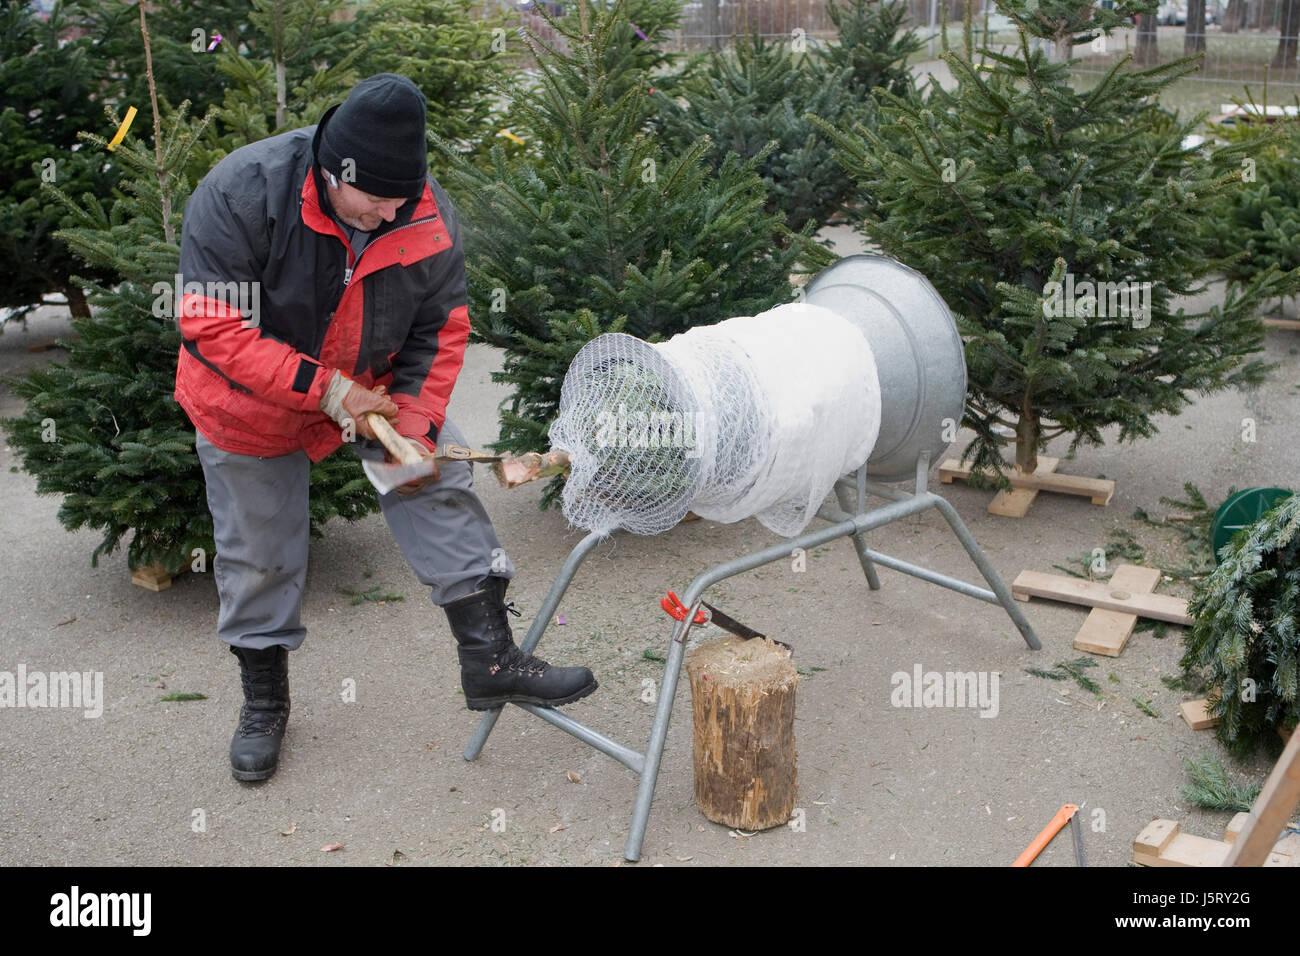 Celebración de fiestas venta de coníferas christmas tree Christmas yule kiosk finamente tejida Foto de stock